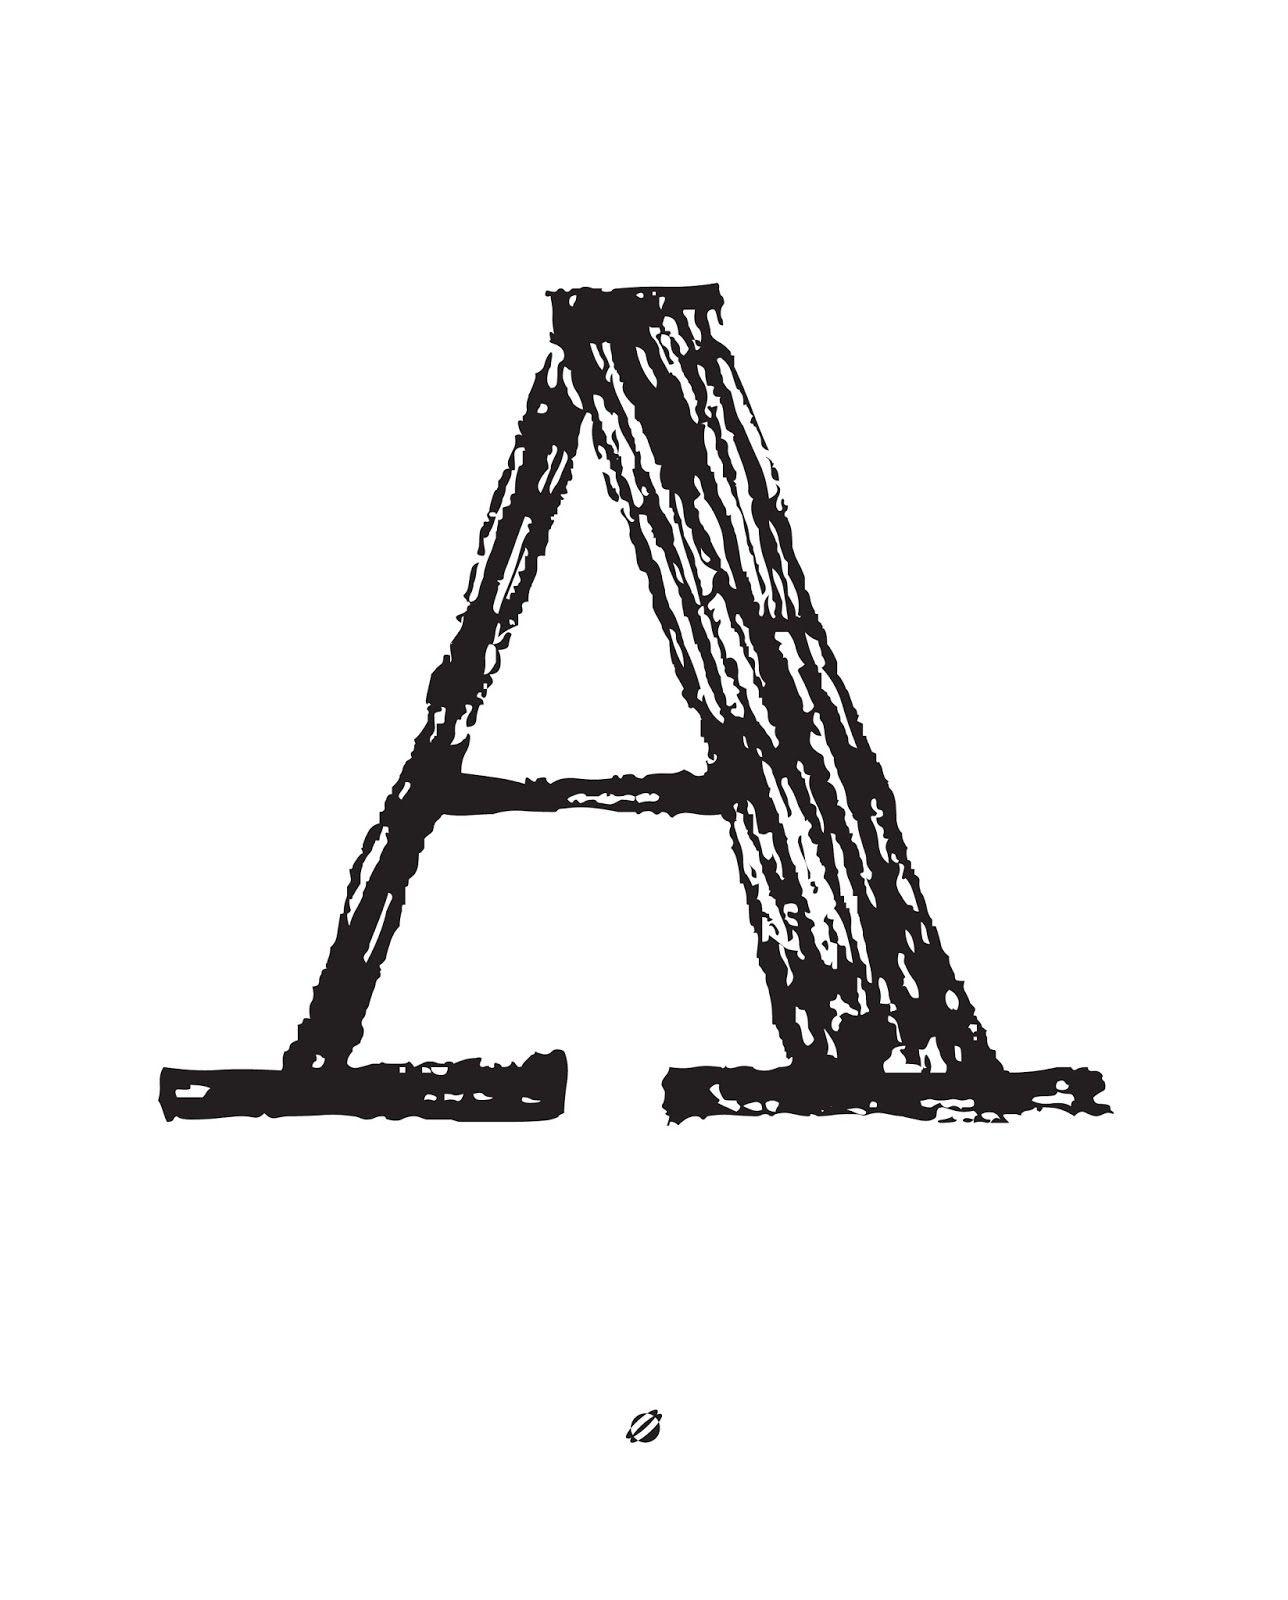 Free Printable Alphabet Letters (A-Z!) // Lostbumblebee | Printables - Free Printable Letters Az